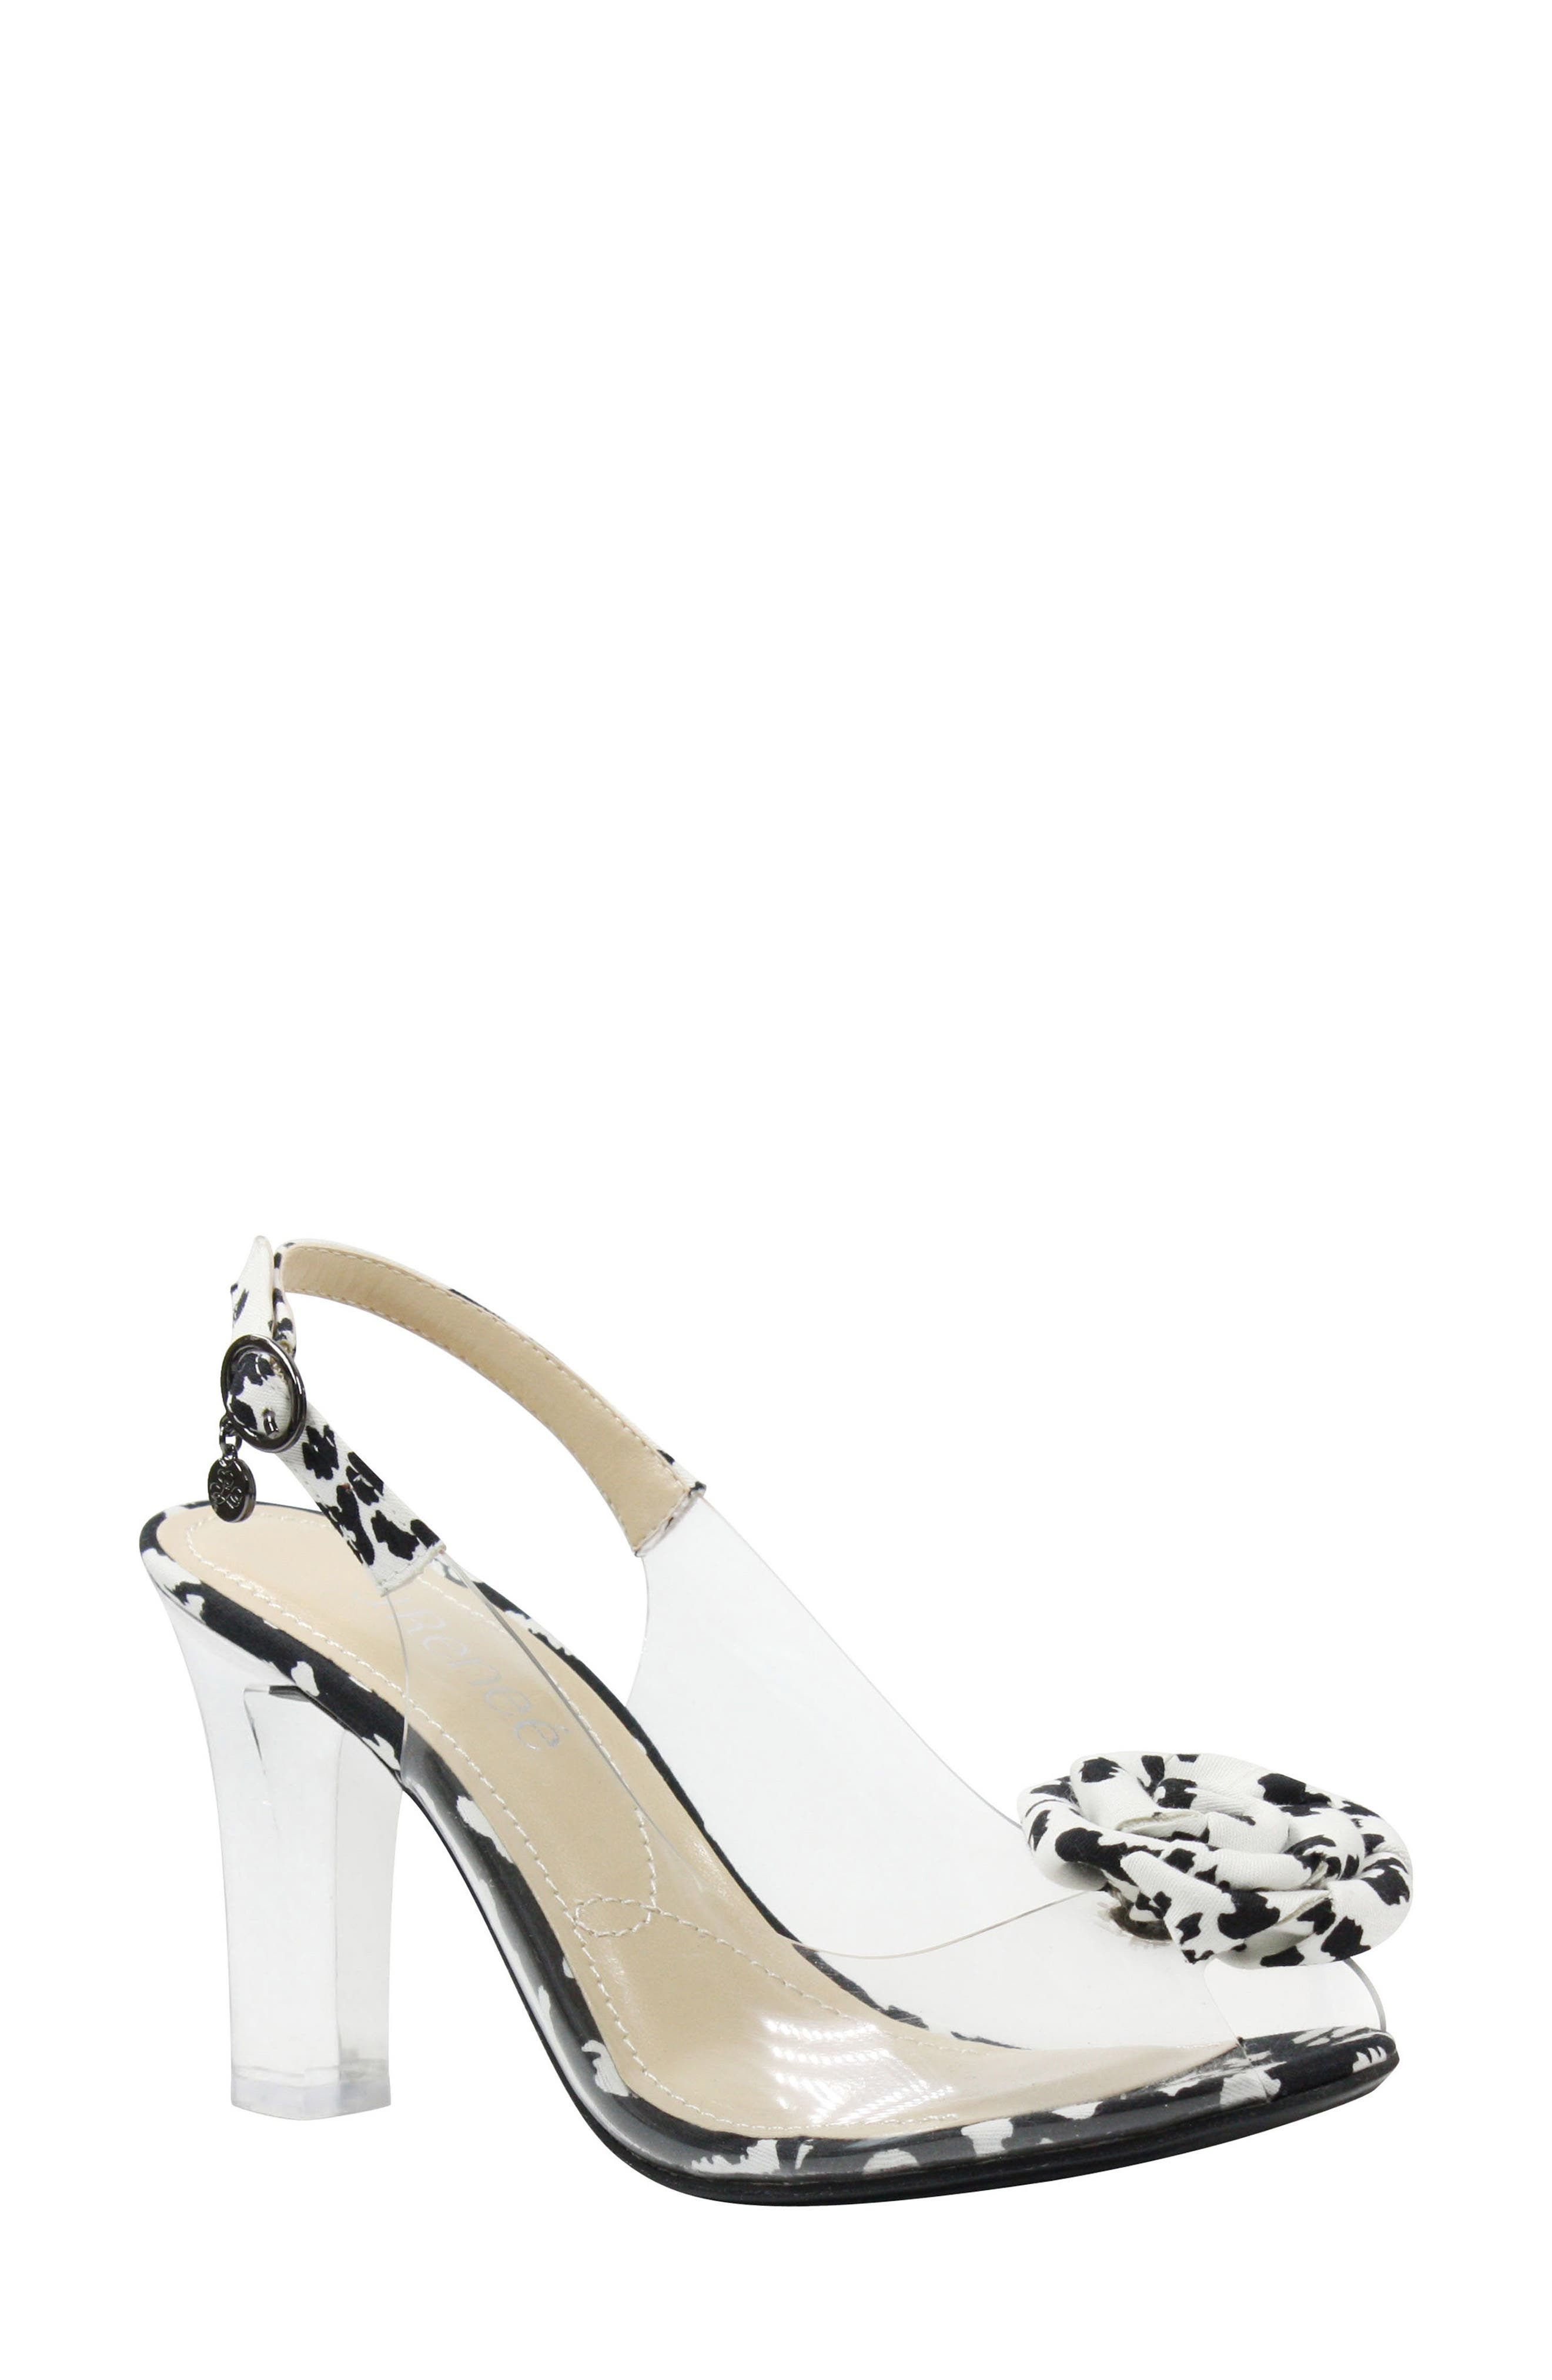 J. Renee Adoracion Slingback Sandal - Black